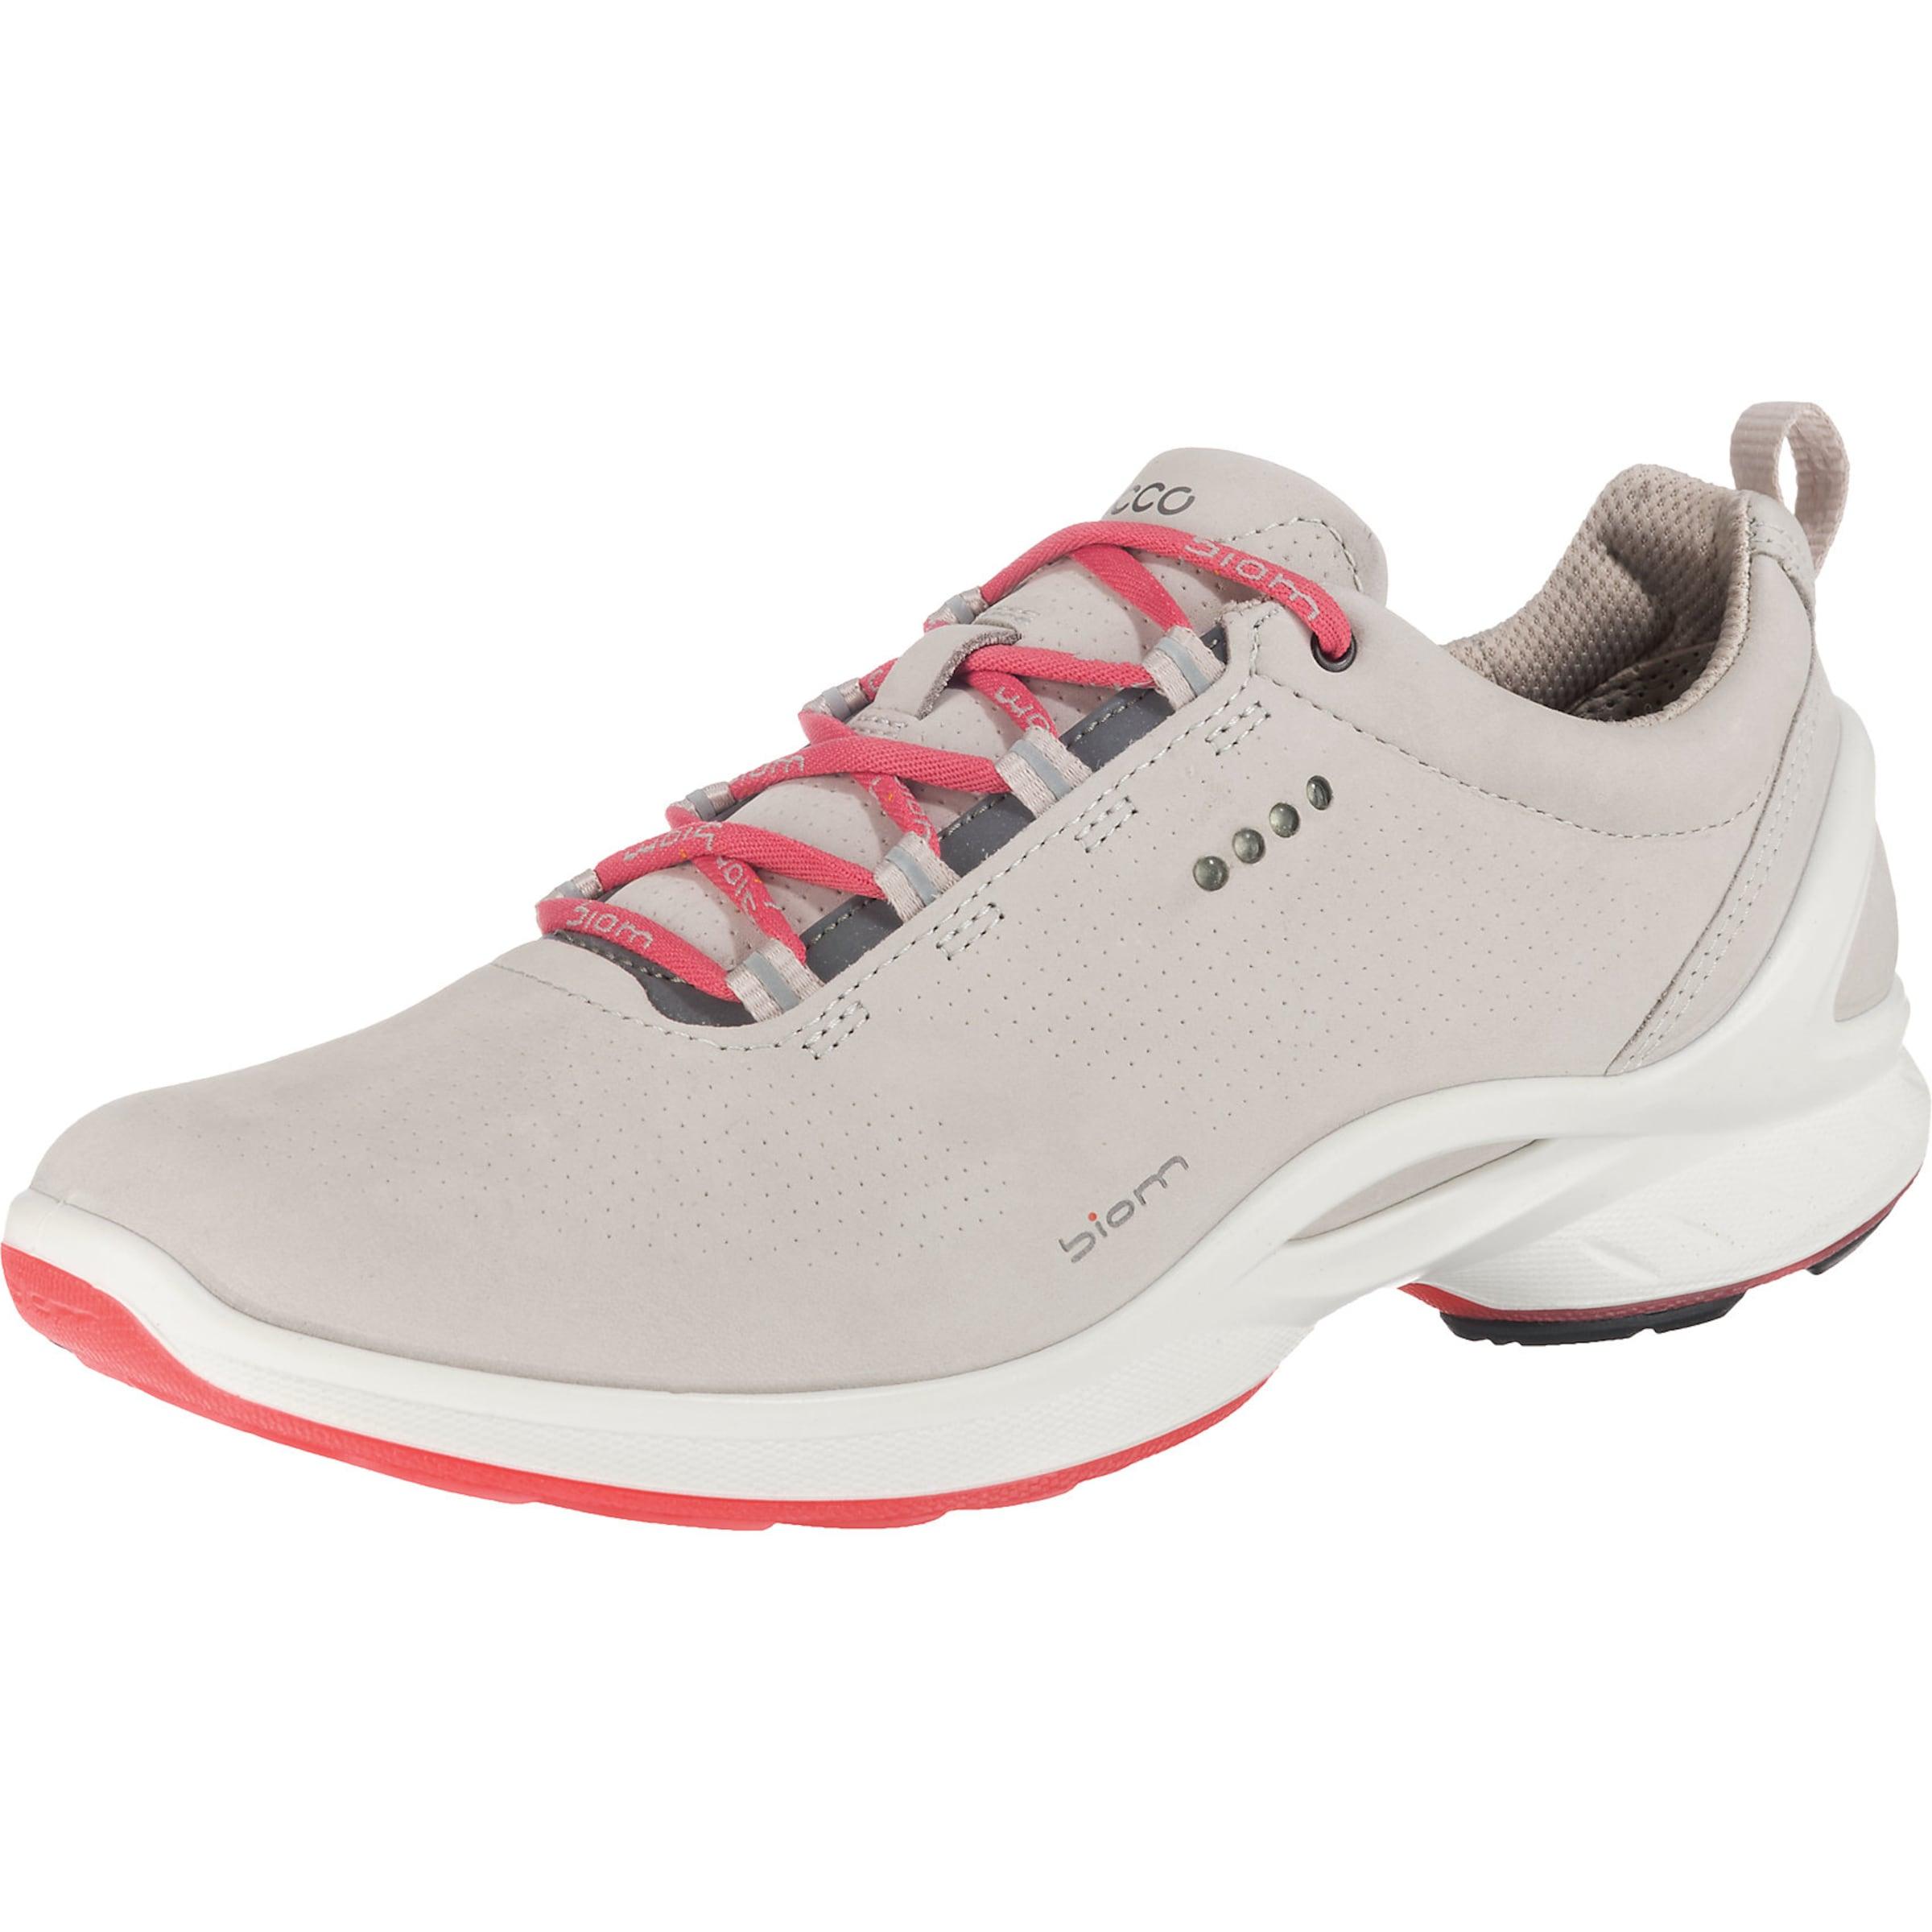 ECCO Sneakers  Biom Fjuel Navy Yabuck Yak